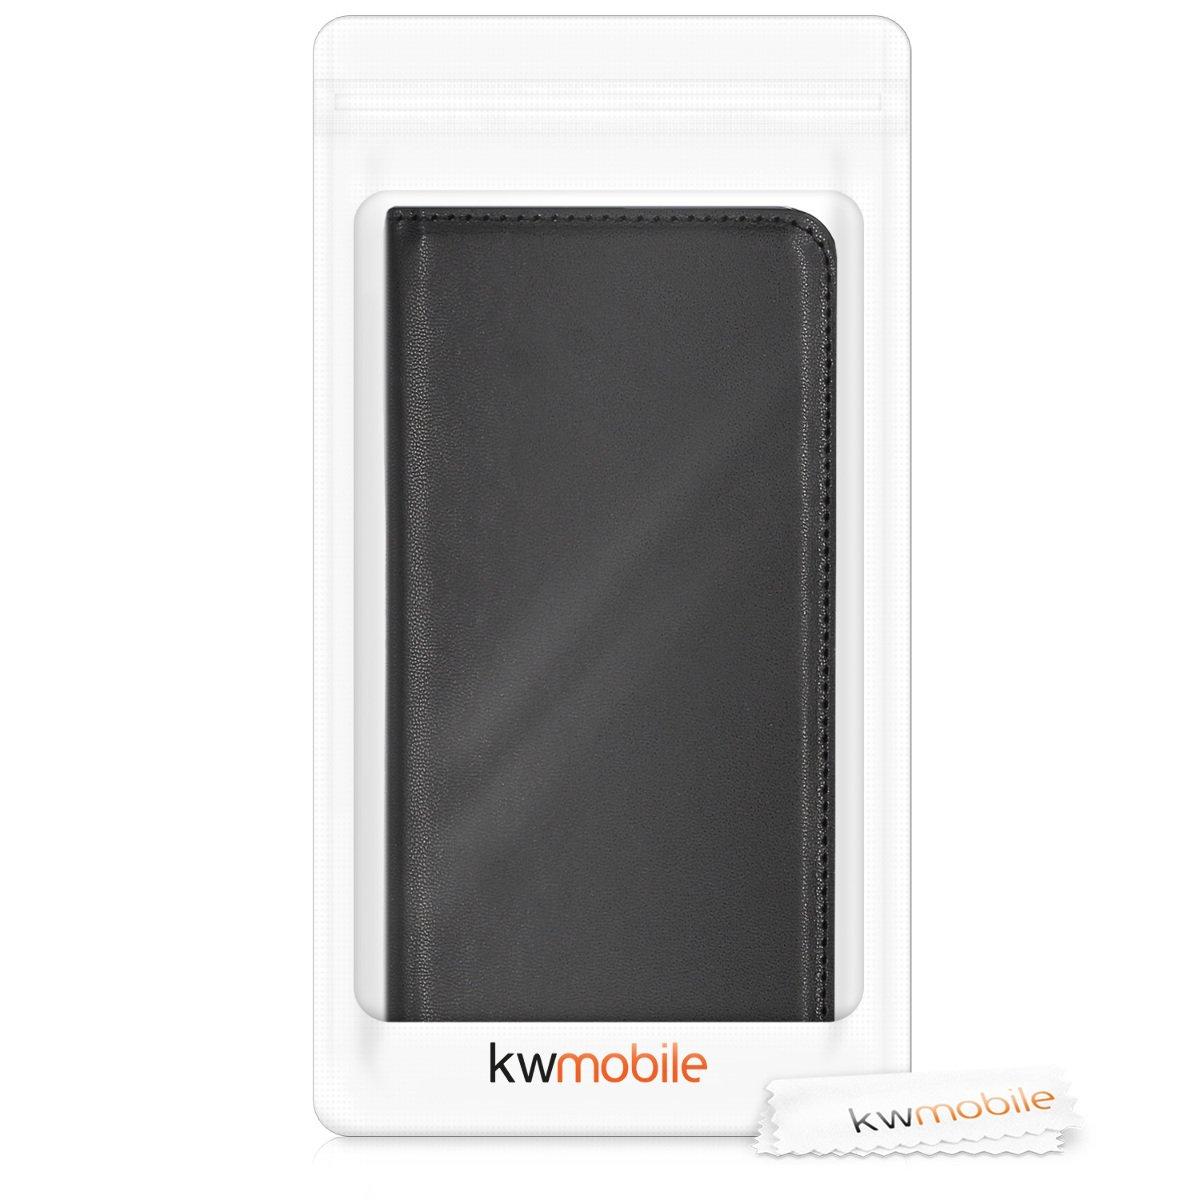 en Cuero sint/ético kwmobile Funda para Huawei Honor 7X // Mate SE - Case Plegable Carcasa para m/óvil de Negro